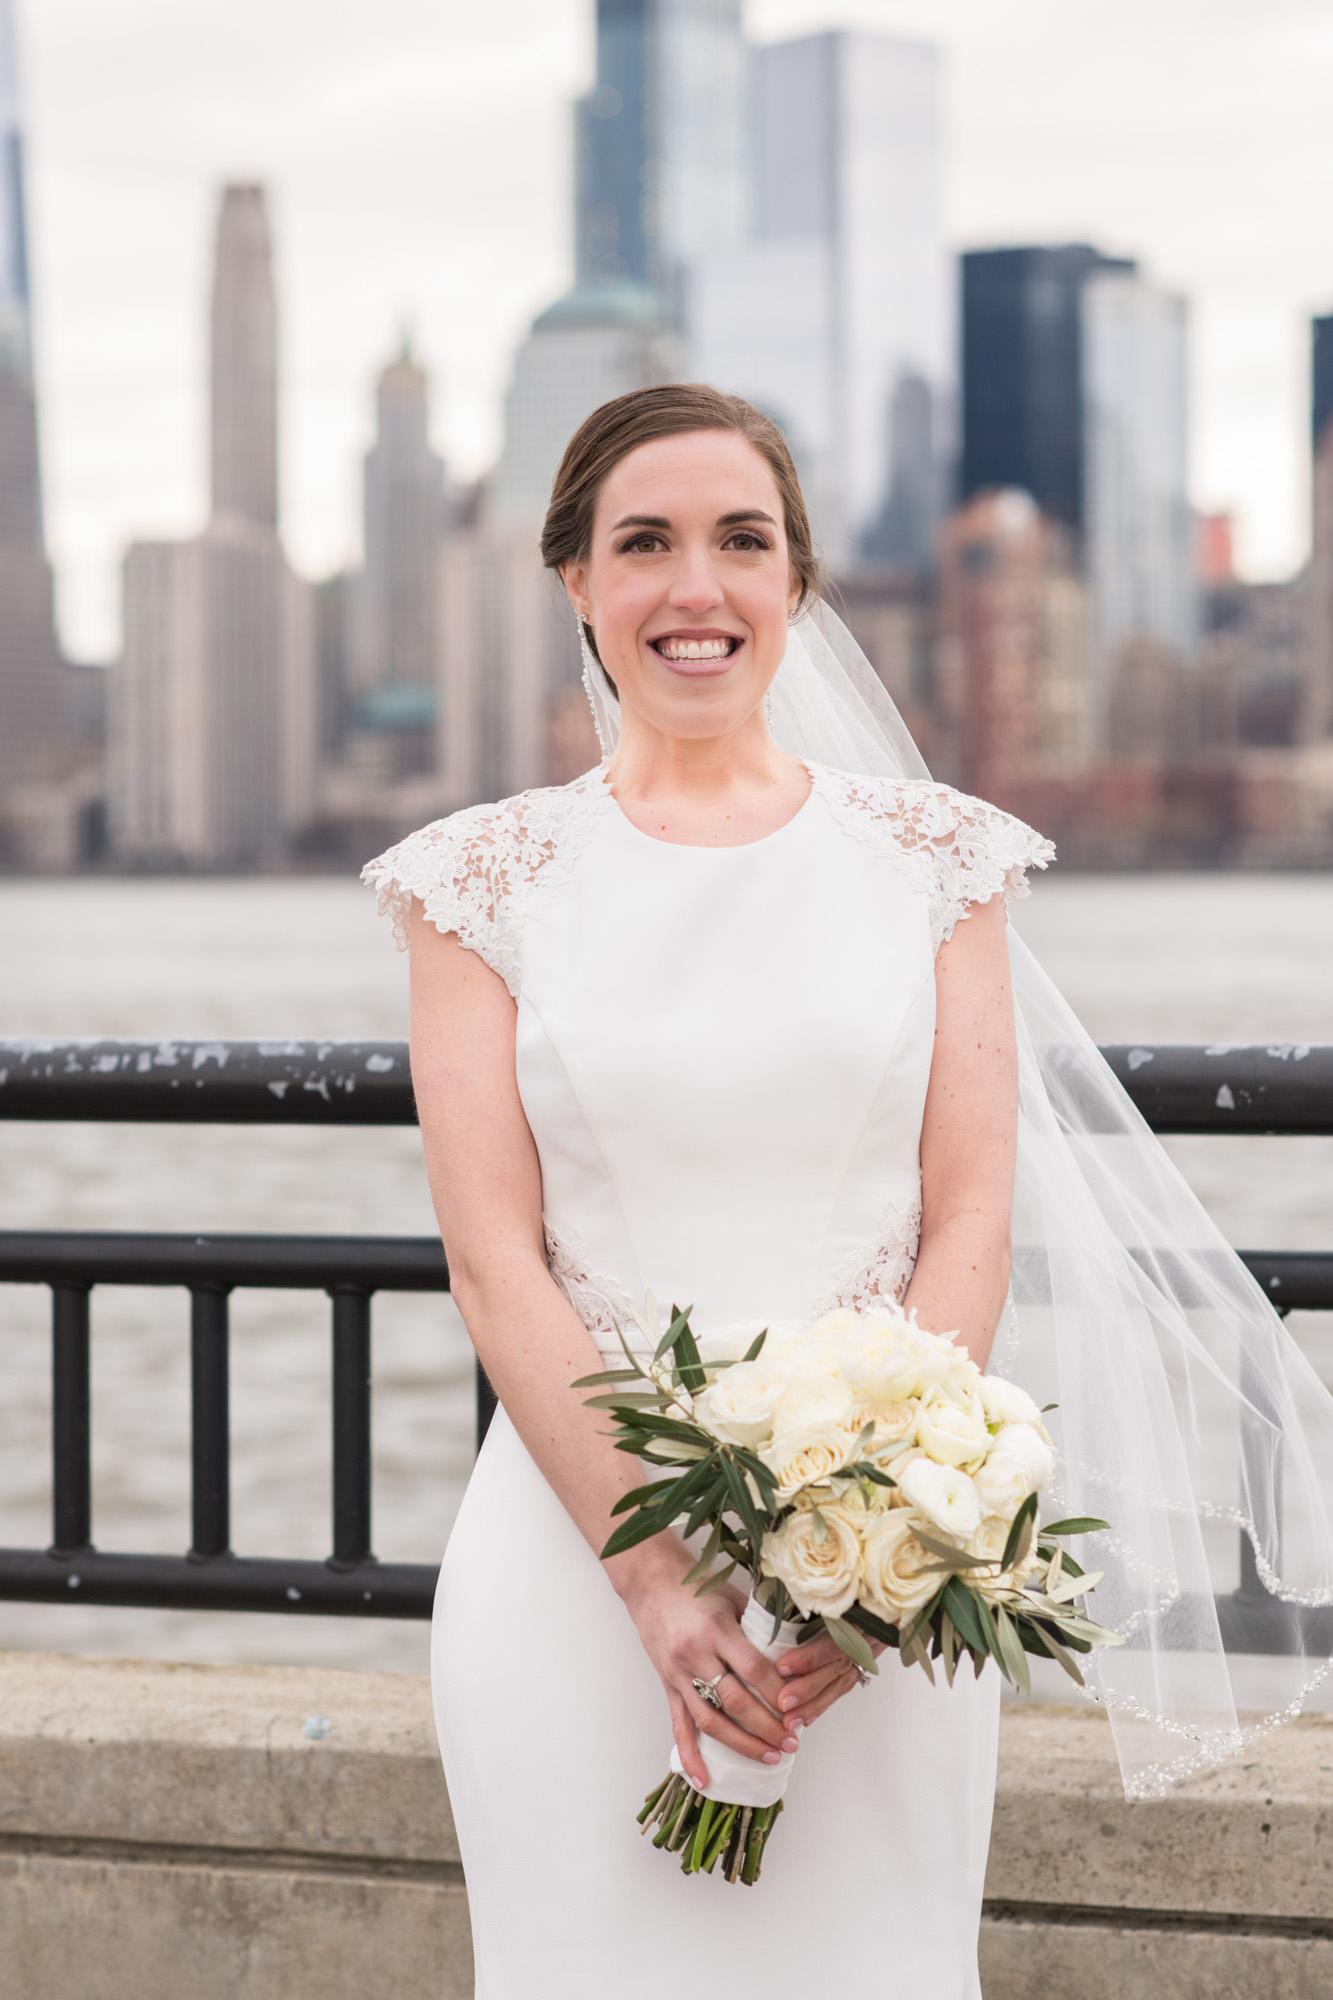 nj-wedding-photographer-maritime-parc-maria-david-26.jpg